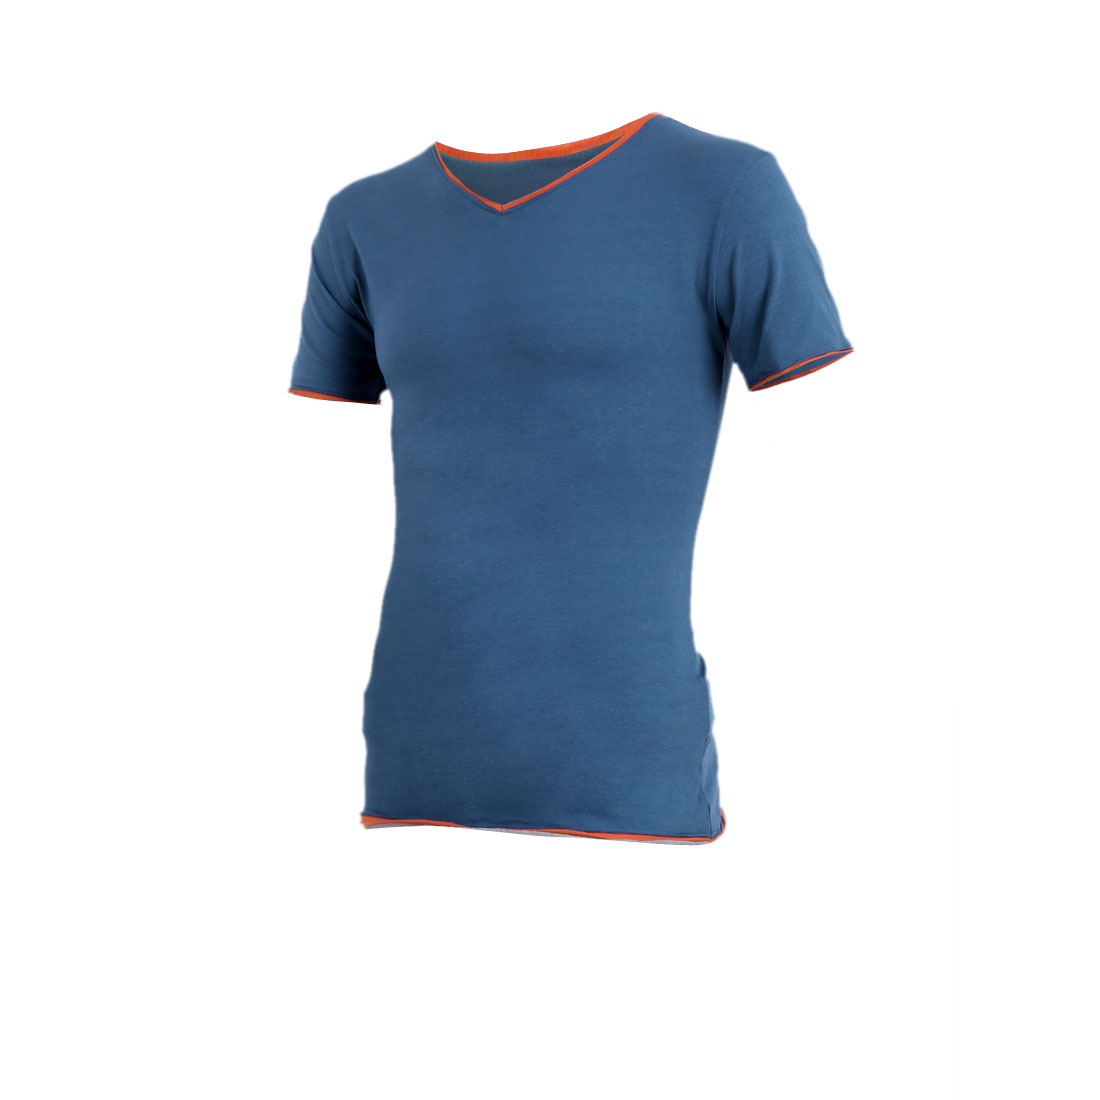 Men Stylish Elastic Splice Detail Indigo Blue Tee Shirt S